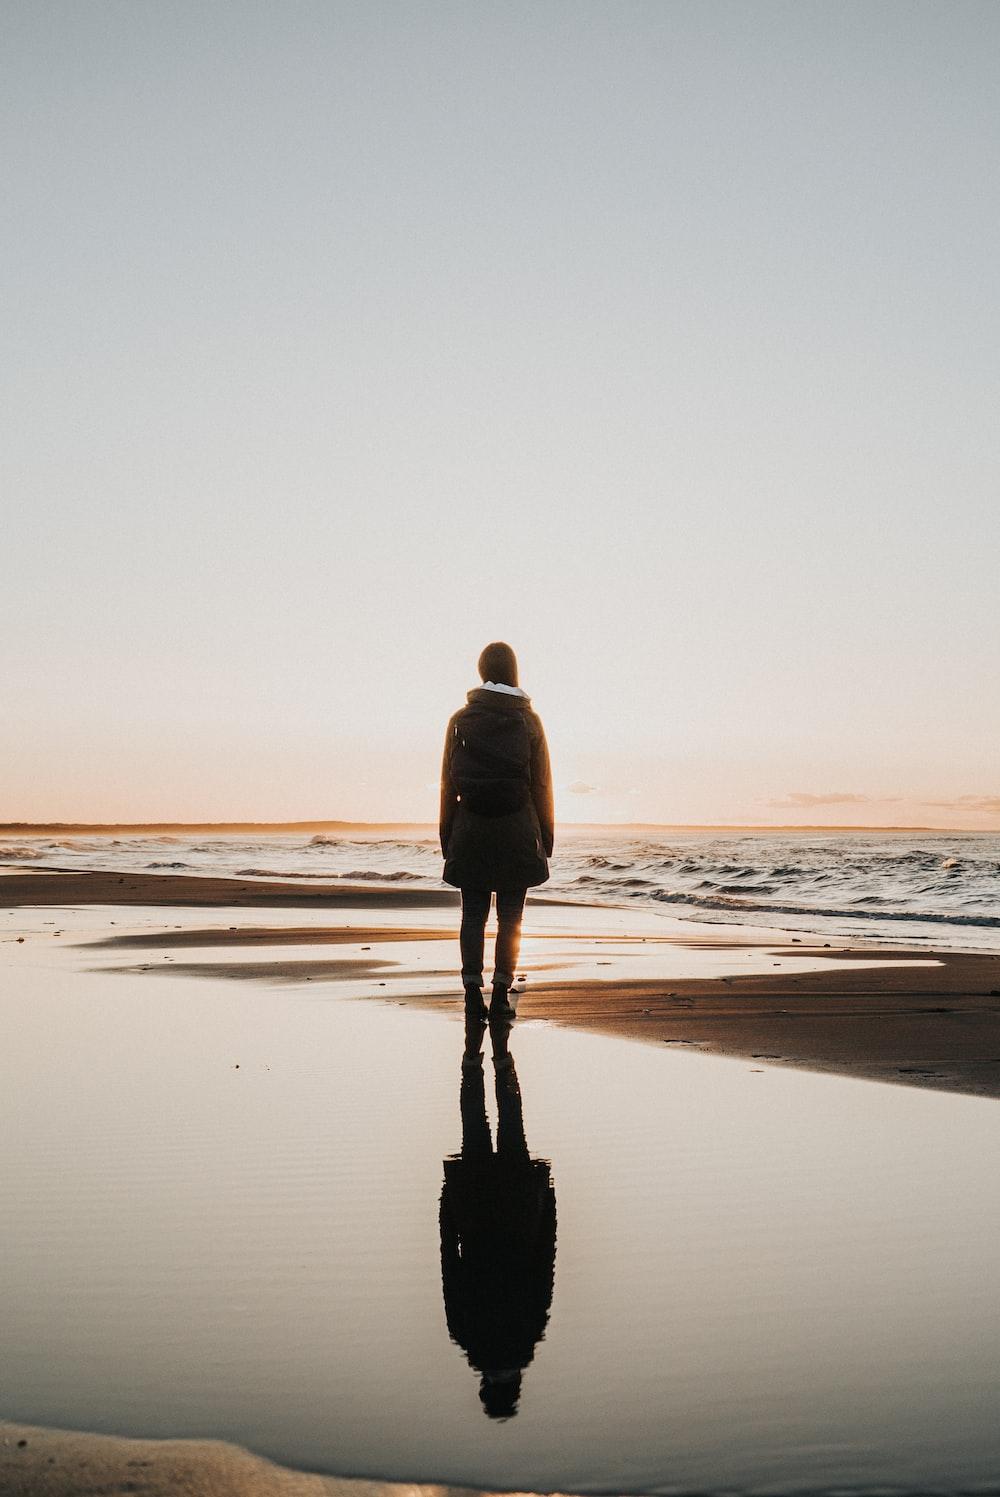 woman standing on sands near shoreline